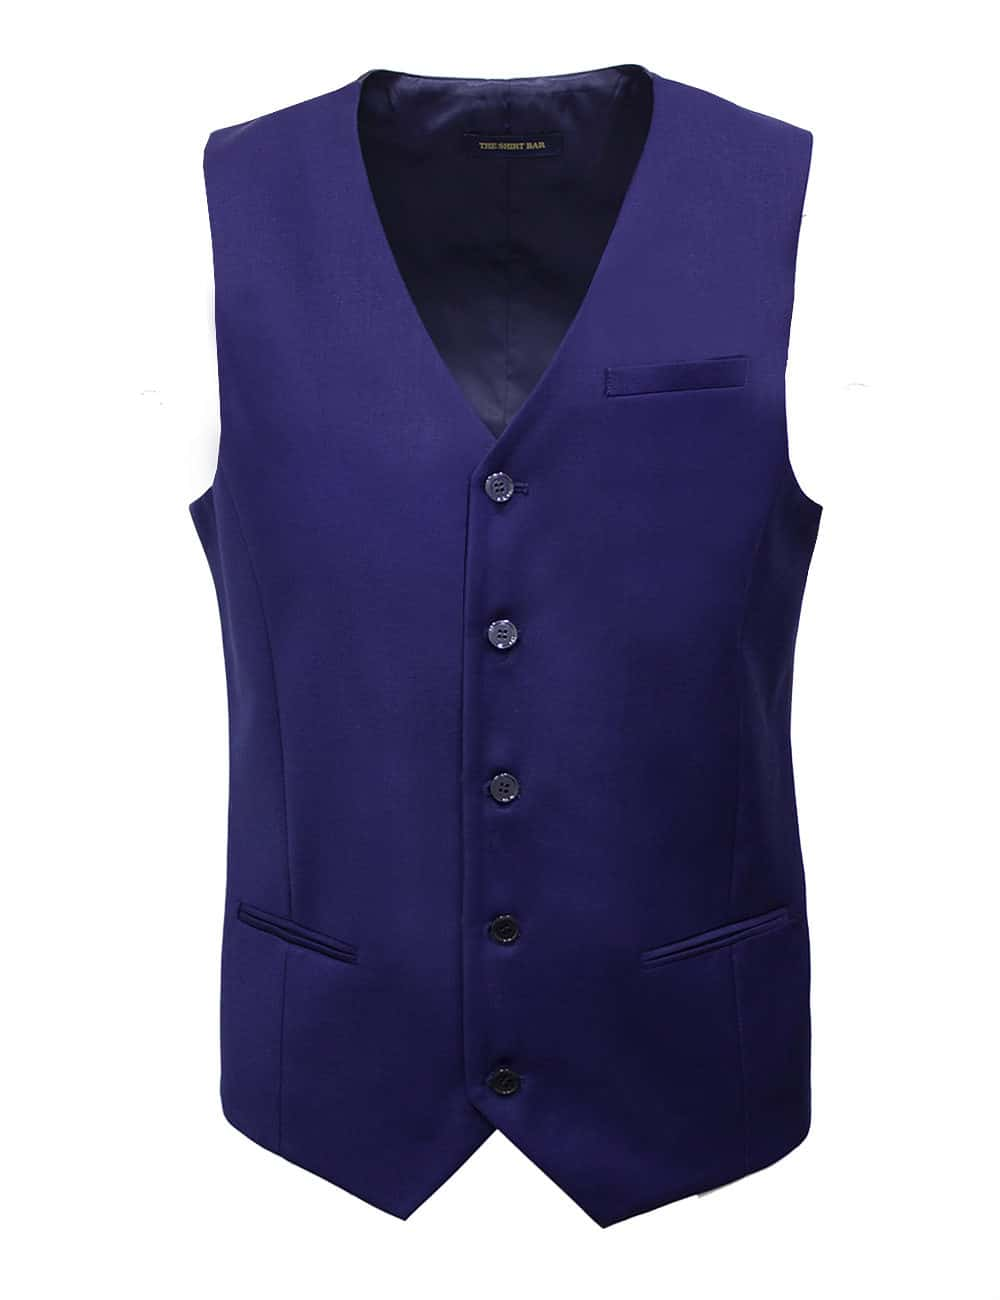 Tailored Fit Navy Twill Single Breasted Vest V1V1.4